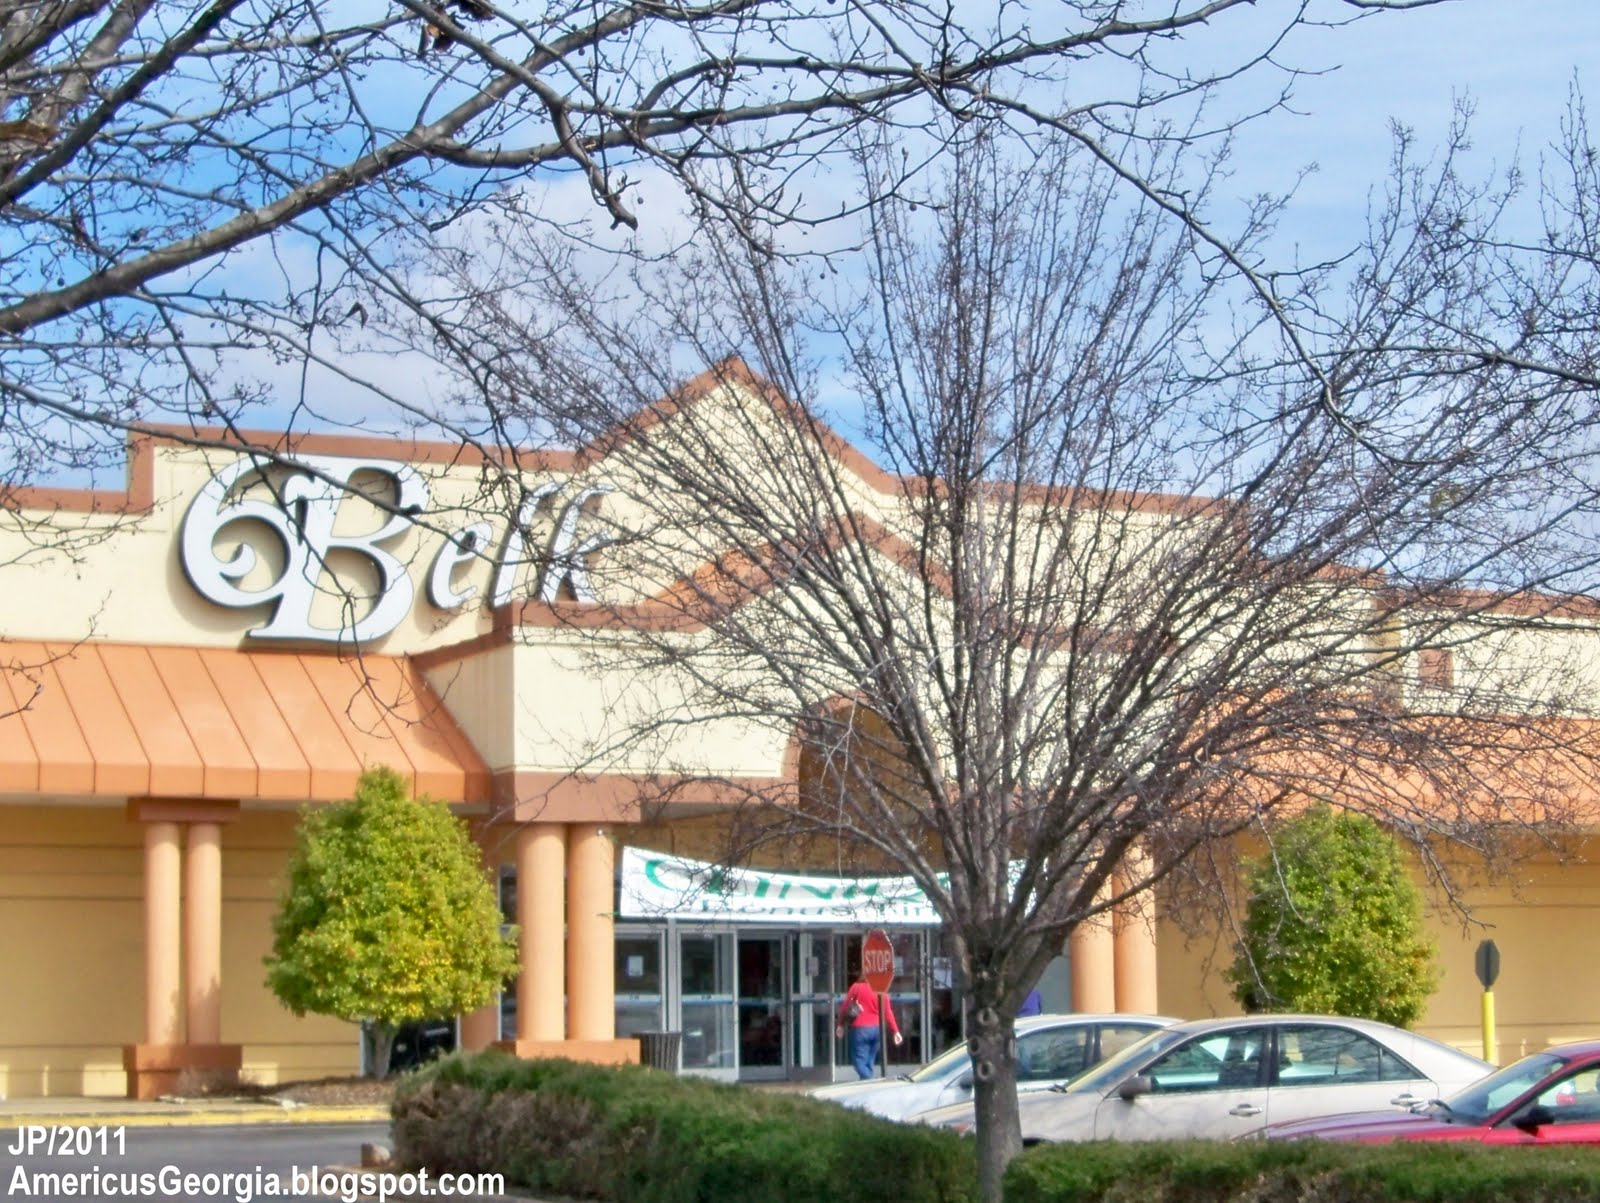 http://1.bp.blogspot.com/-3OFU-fU3ZcM/Tf__8KE7U-I/AAAAAAADny4/BHyYxpTiCs8/s1600/BELK+AMERICUS+GEORGIA%252C+Belk+Womens+Mens+Clothing+Department+Store+AmericusGA..JPG